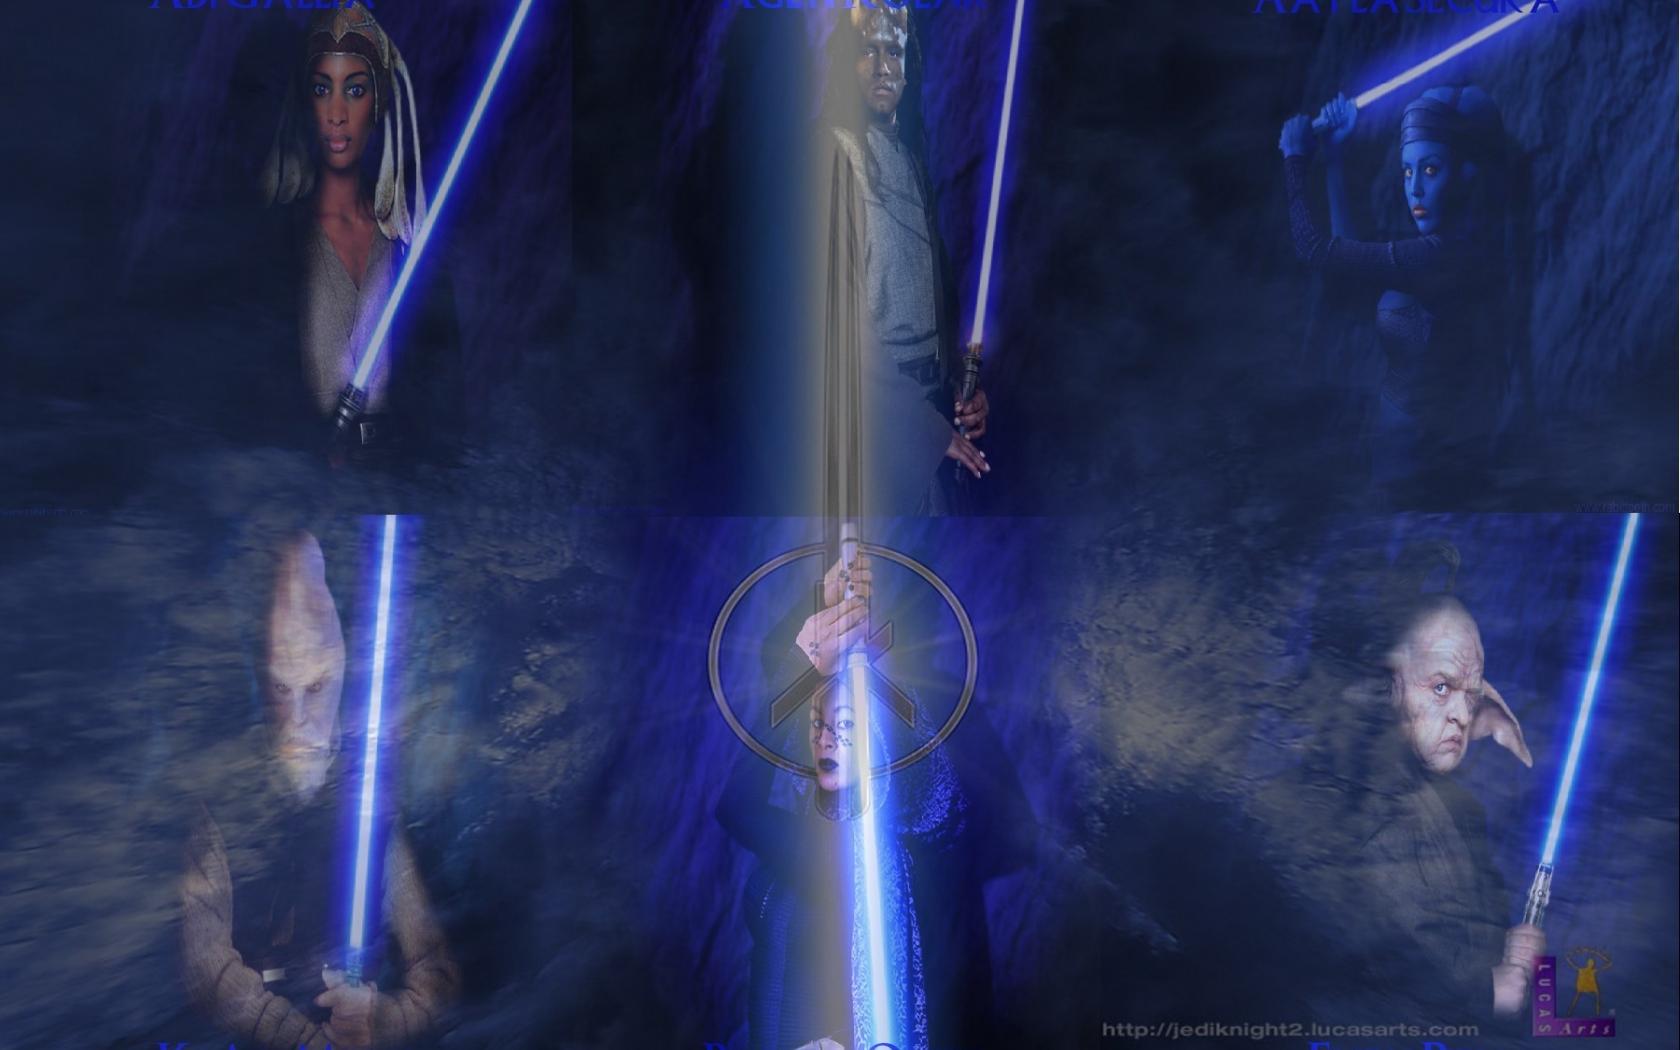 Free Download Star Wars Jedi Knight Wallpaper Star Wars Jedi Knights 1800x1200 For Your Desktop Mobile Tablet Explore 48 Jedi Knight Wallpaper Star Wars Jedi Wallpaper Hd Jedi Symbol